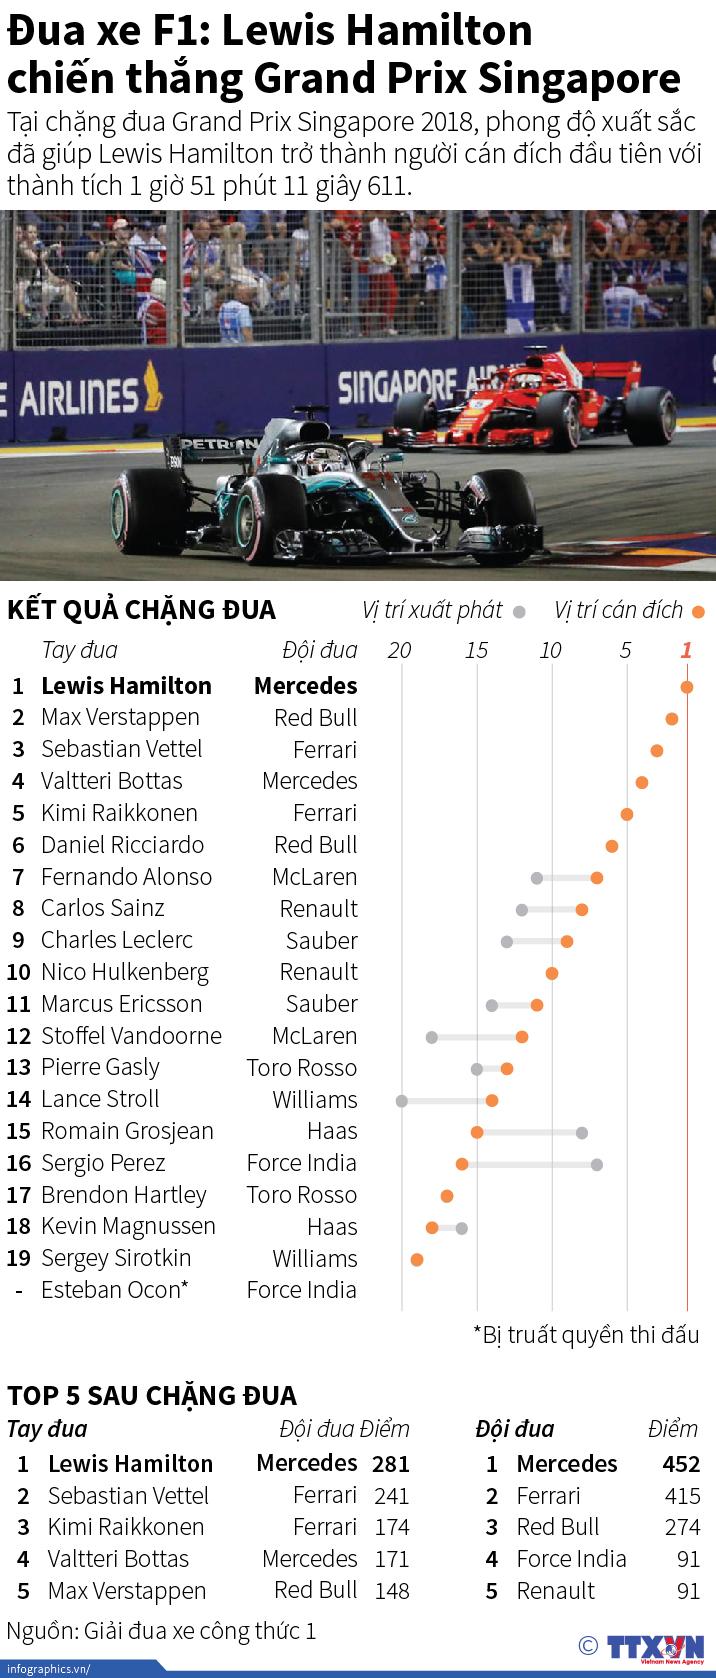 Đua xe F1: Lewis Hamilton chiến thắng Grand Prix Singapore